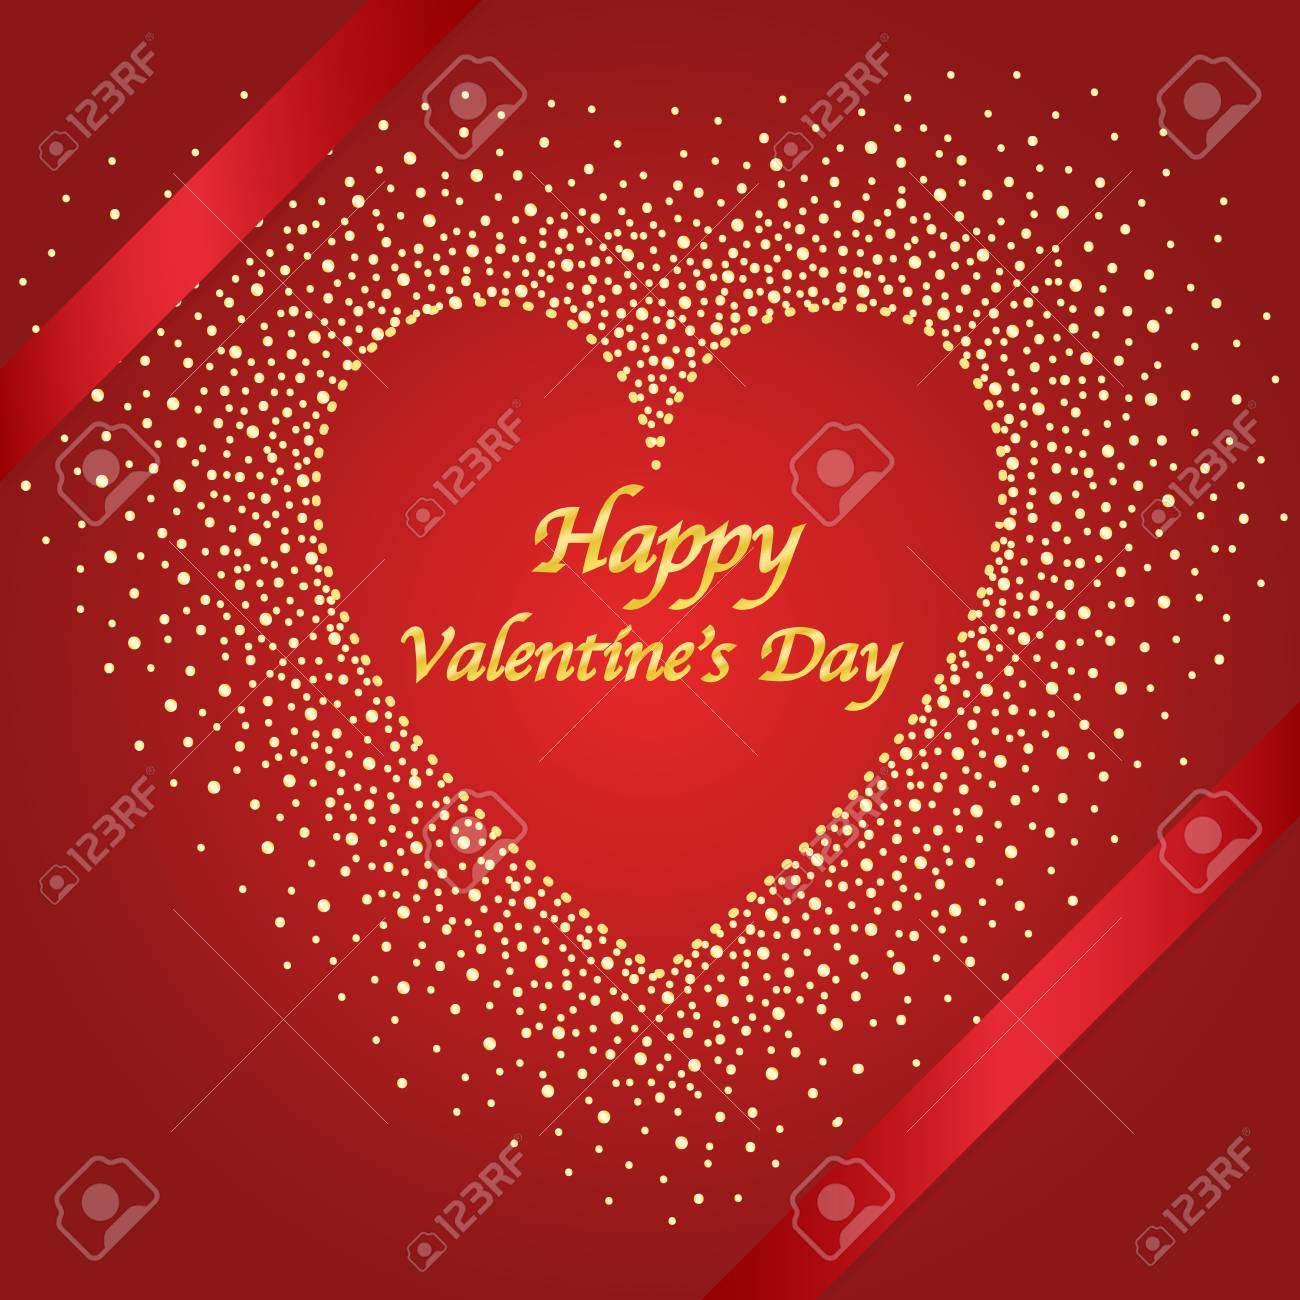 images of Valentine - 36572842